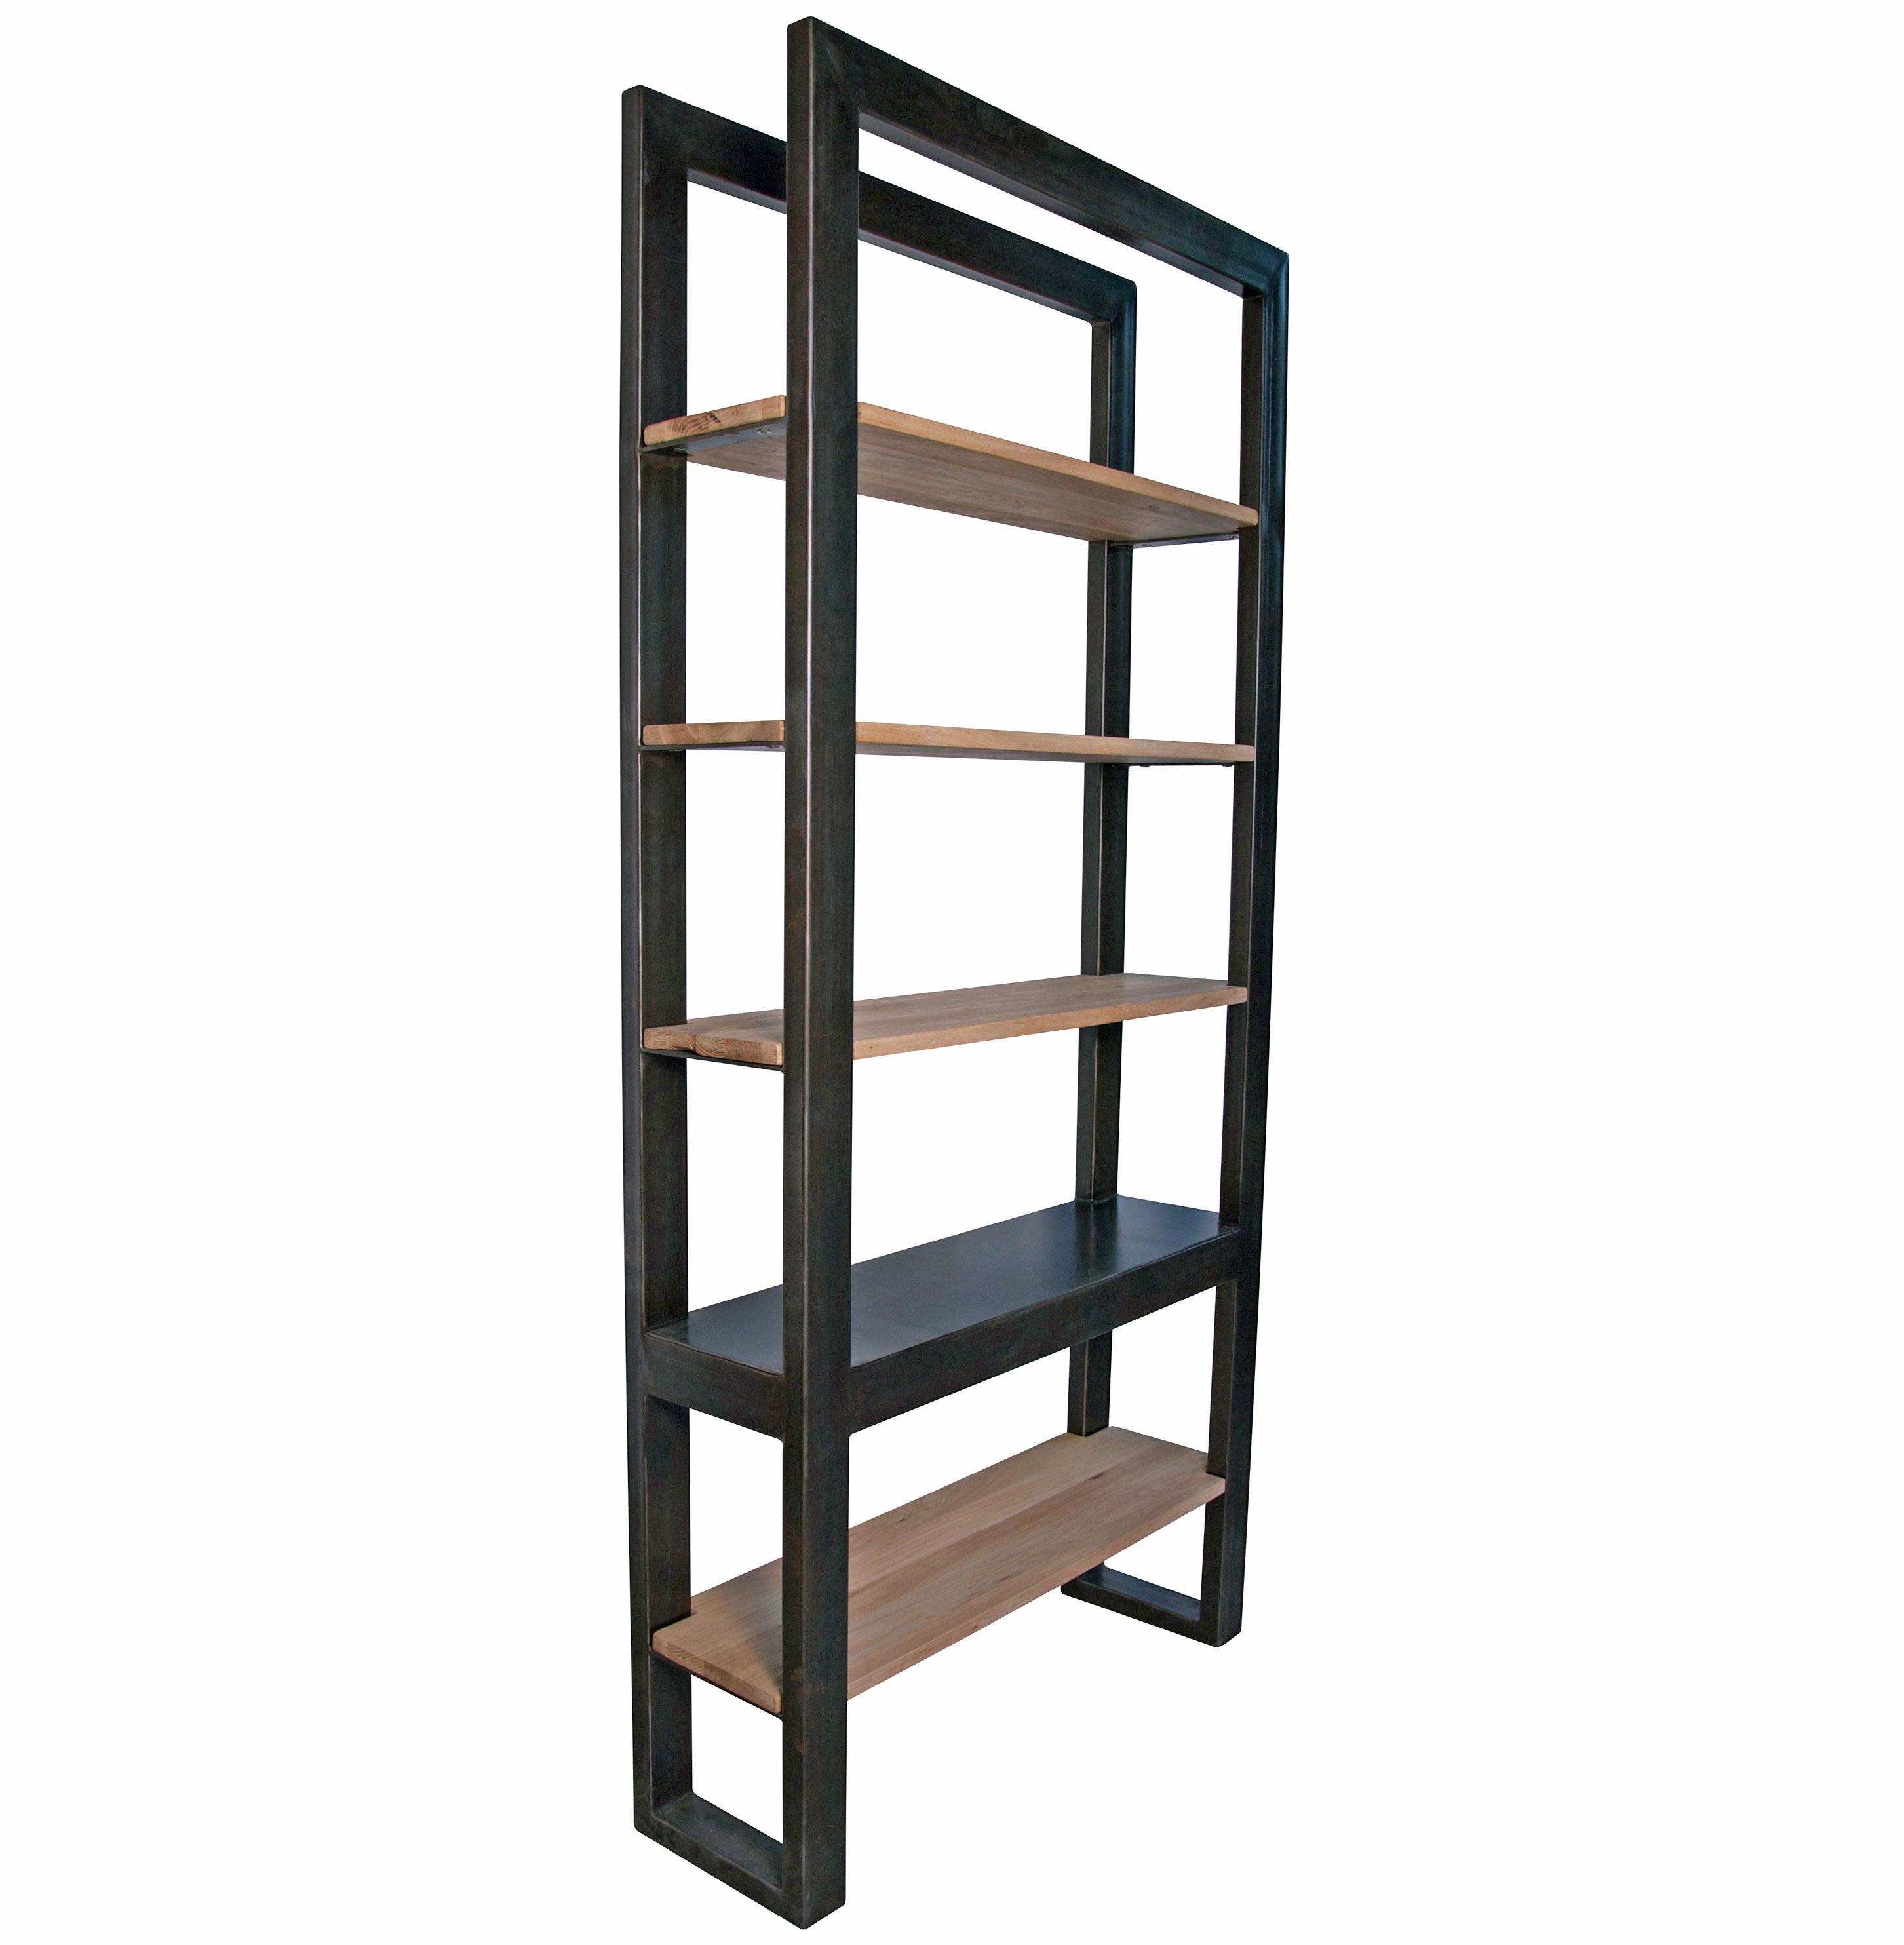 Millerton Metal Distressed Wood Industrial Loft Bookcase